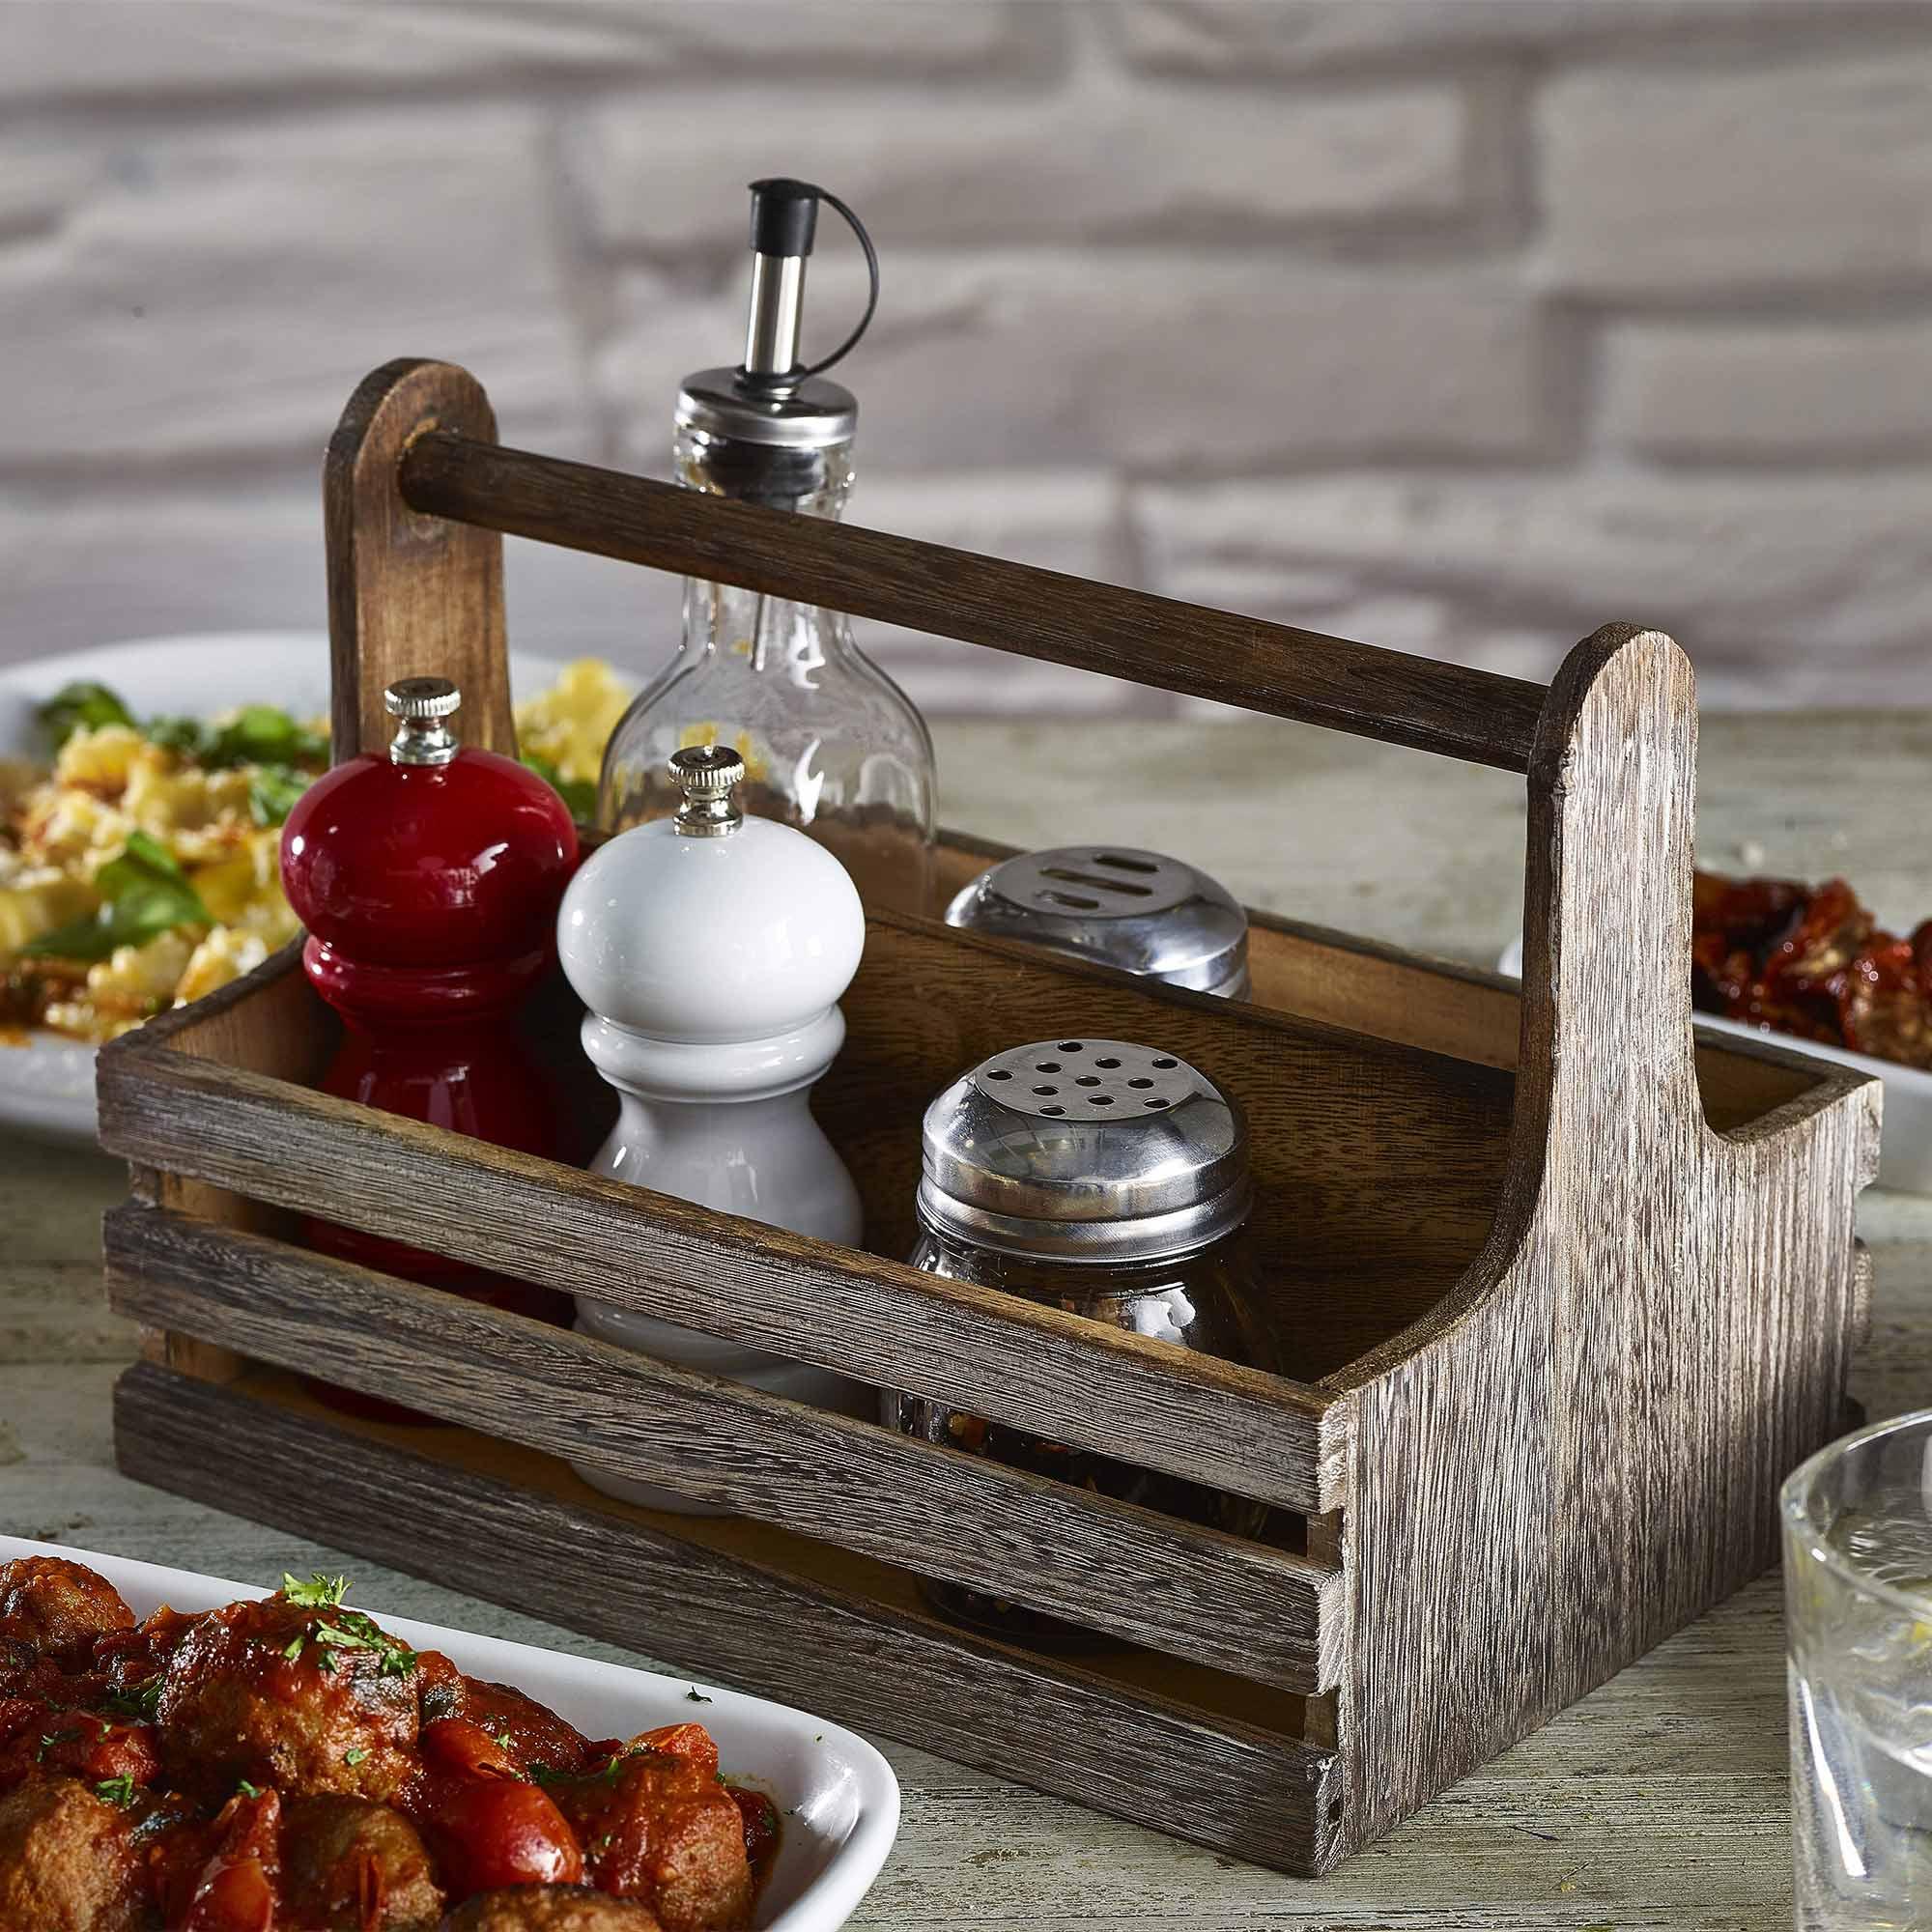 Dining Table Caddy Interdesign Silverware Flatware Caddy  : 129744large from joshandira.com size 2000 x 2000 jpeg 325kB